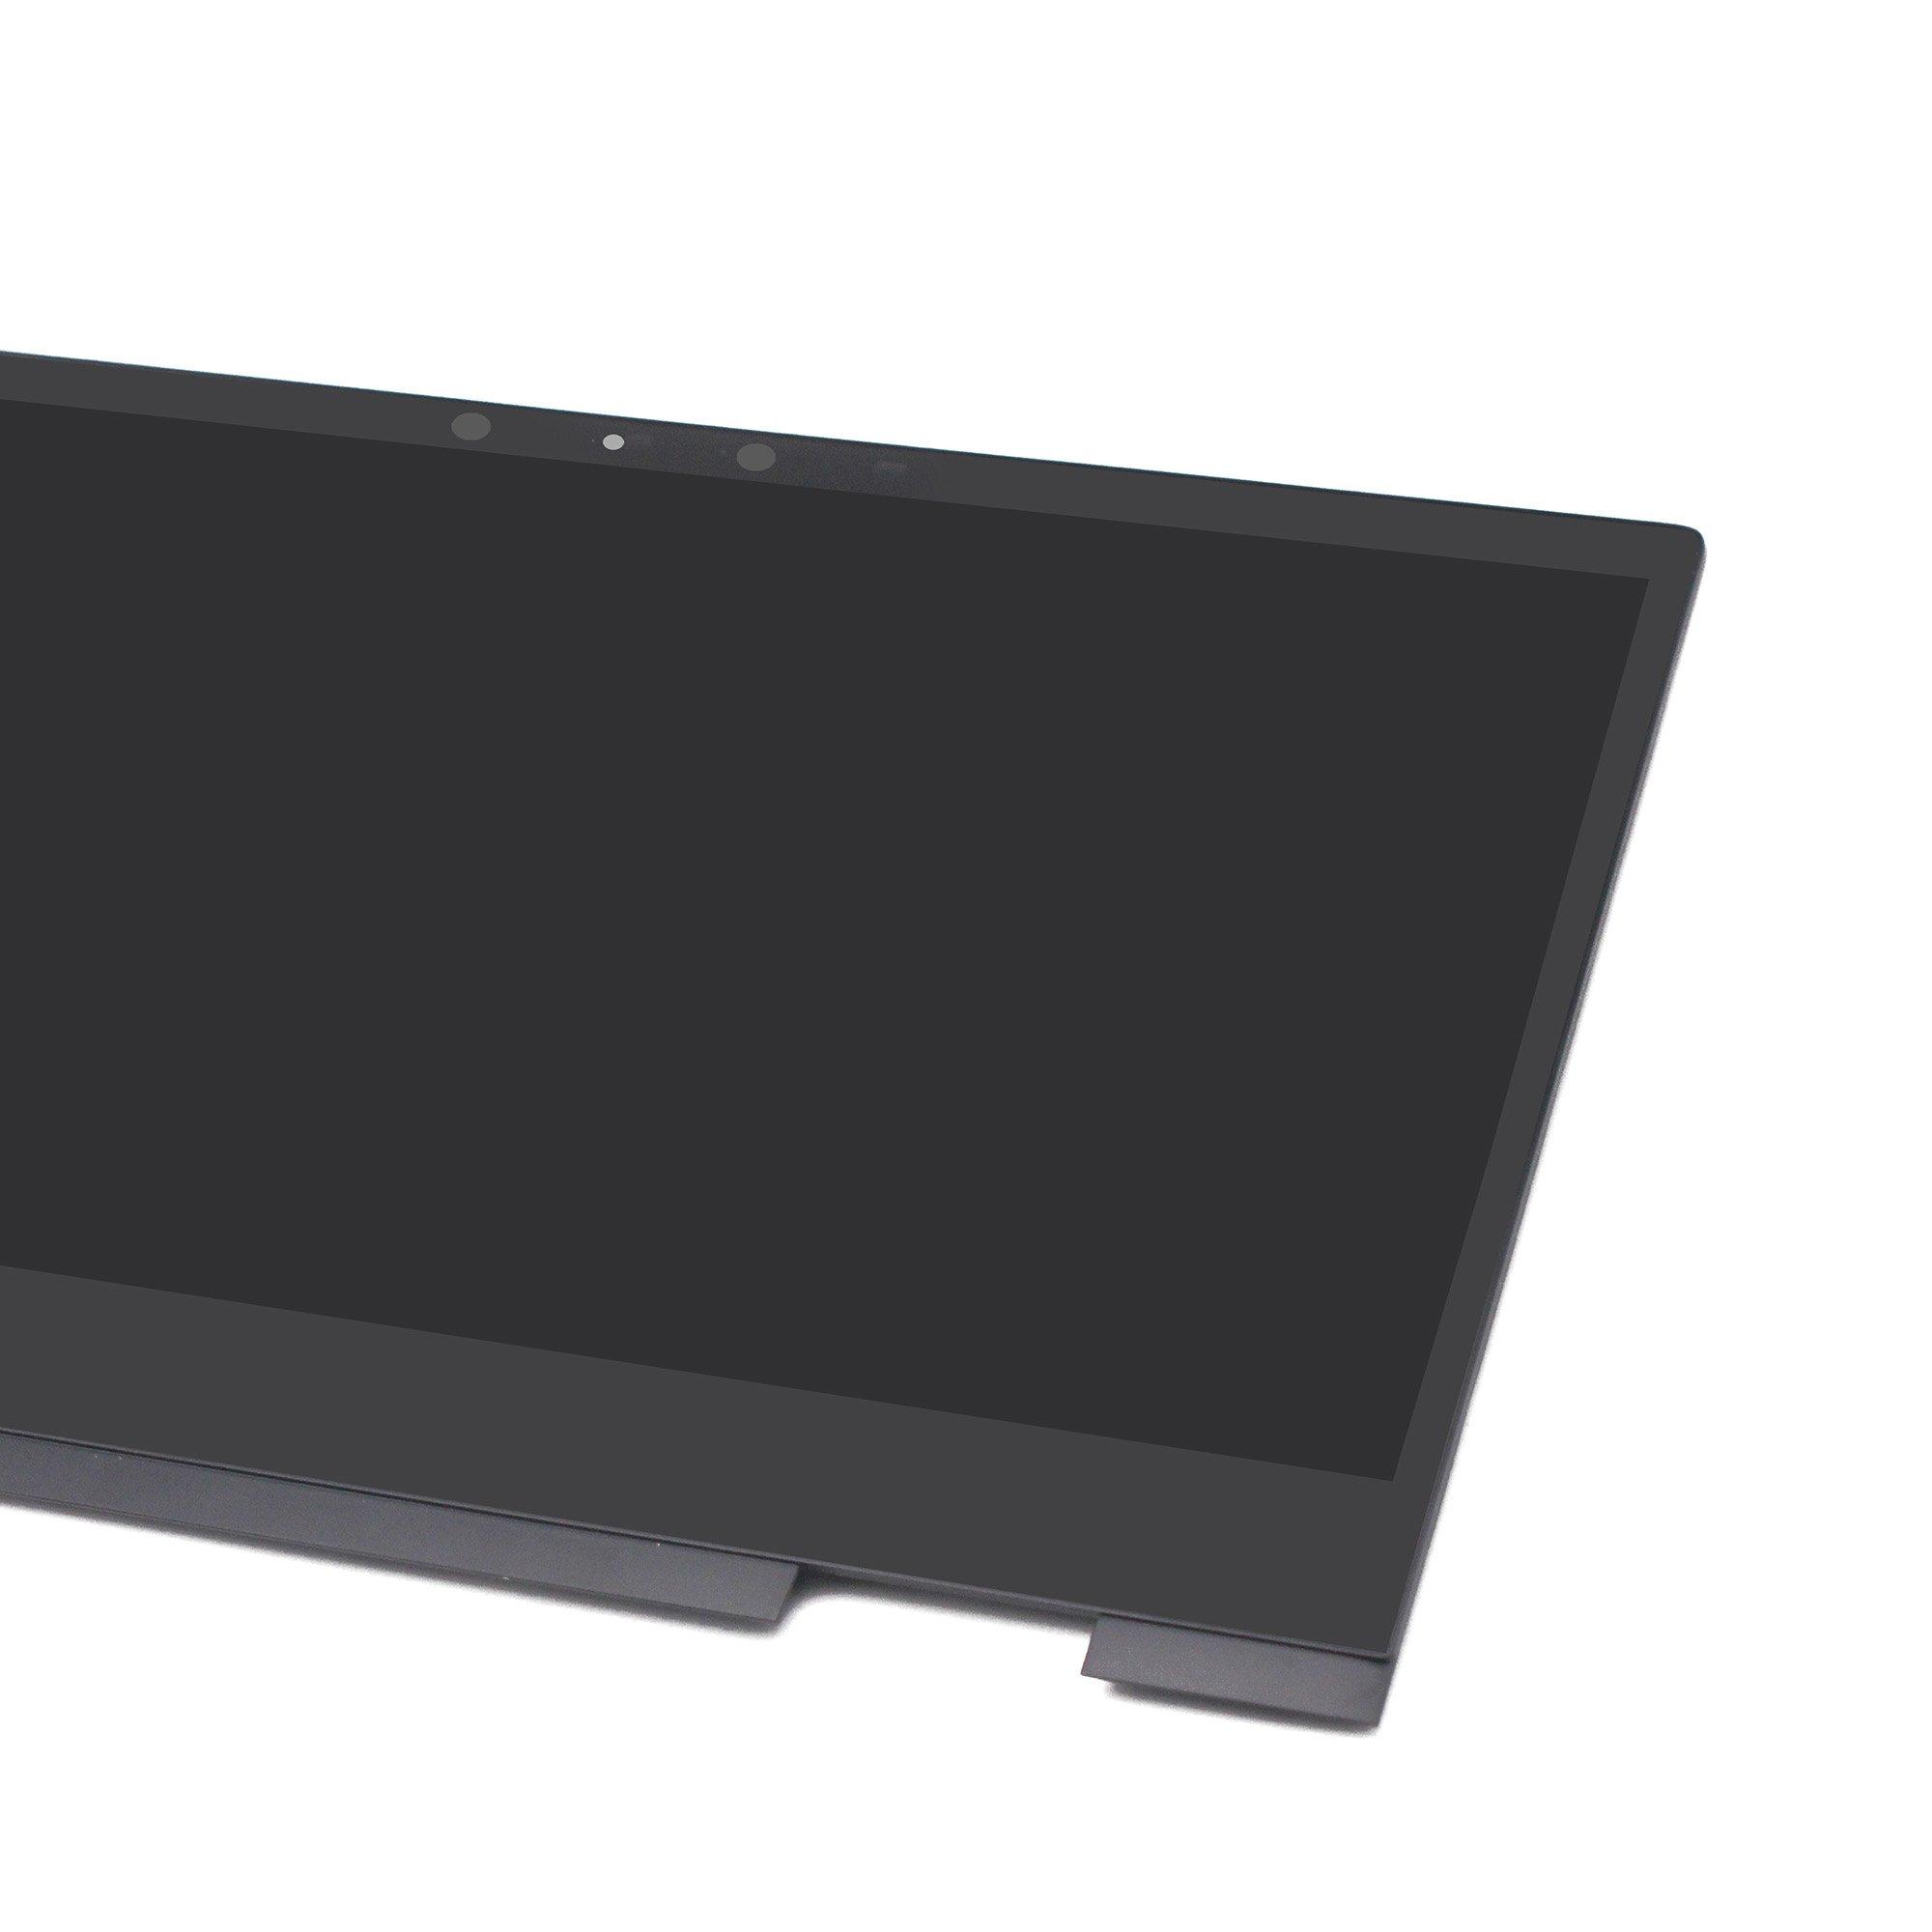 LCDOLED 15.6'' FullHD IPS LCD Touch Screen Digitizer Assembly + Bezel + Board for HP Envy x360 15-bq 15-bq000 15-bq100 15m-bq000 15m-bq100 15m-bq021dx 15m-bq121dx 15-bq175nr 15-bq075nr 15-bq051nr by LCDOLED (Image #4)